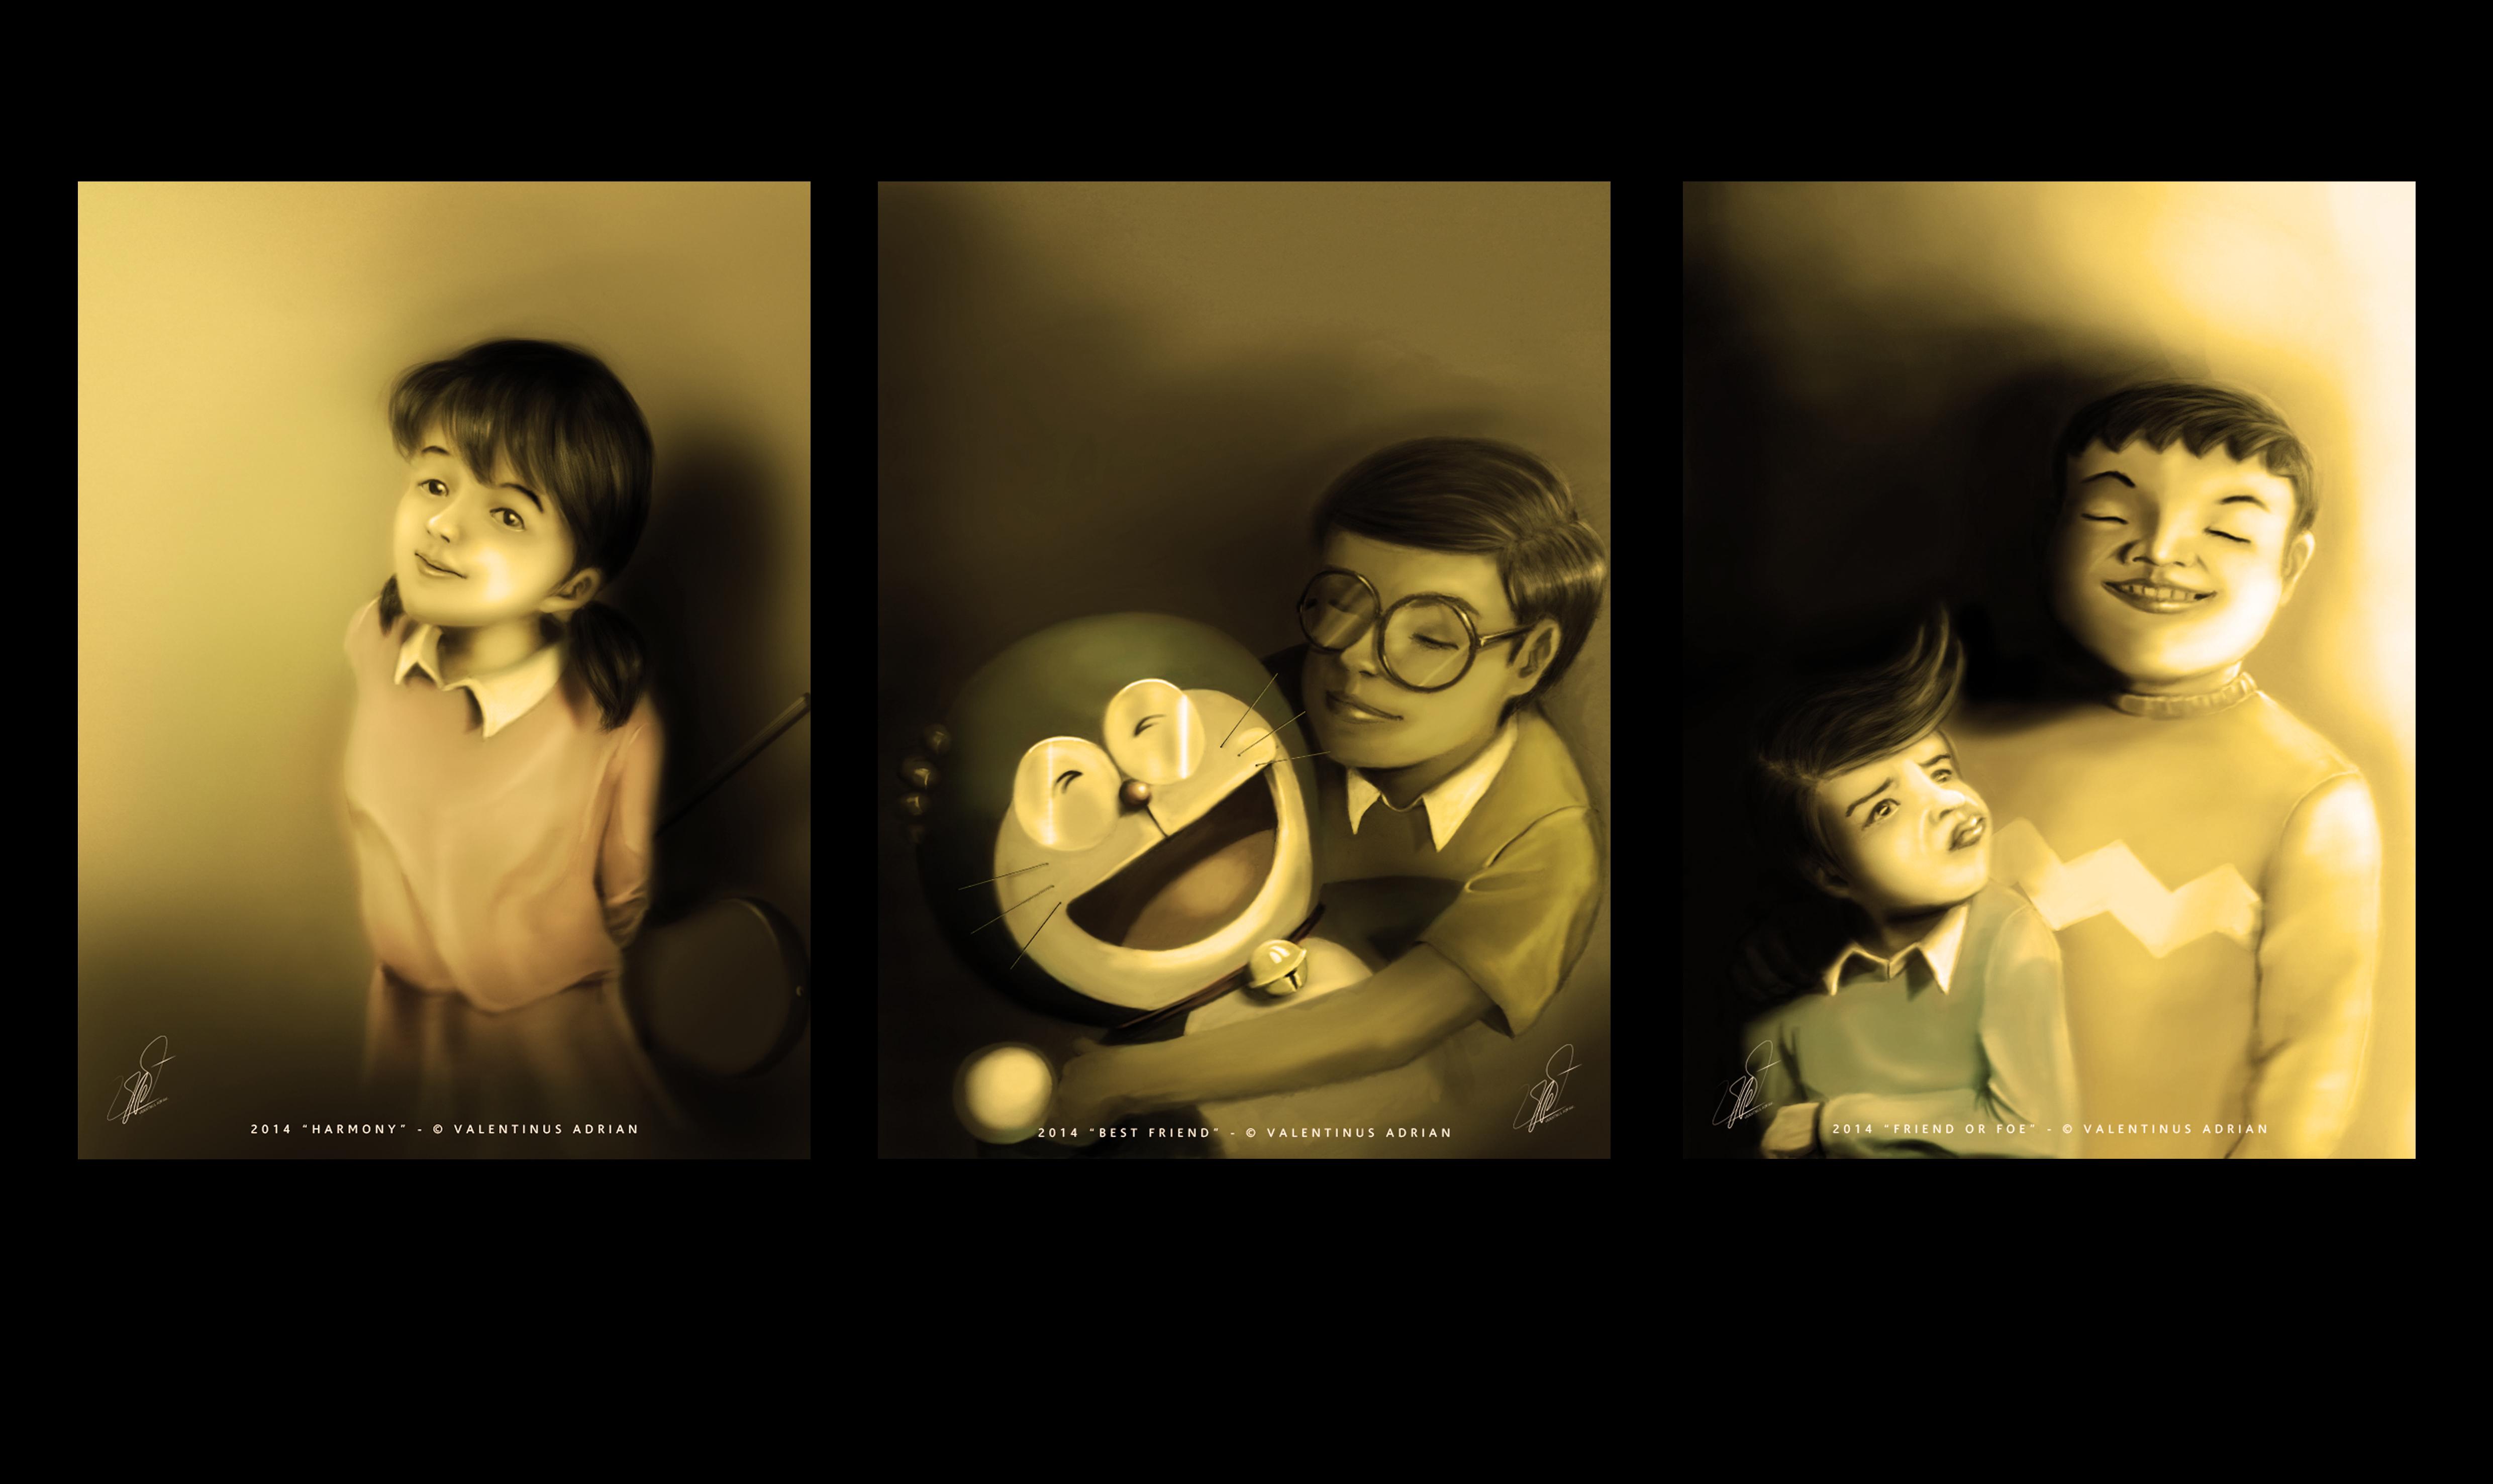 Doraemon-O Gato do Futuro Character wallpaper